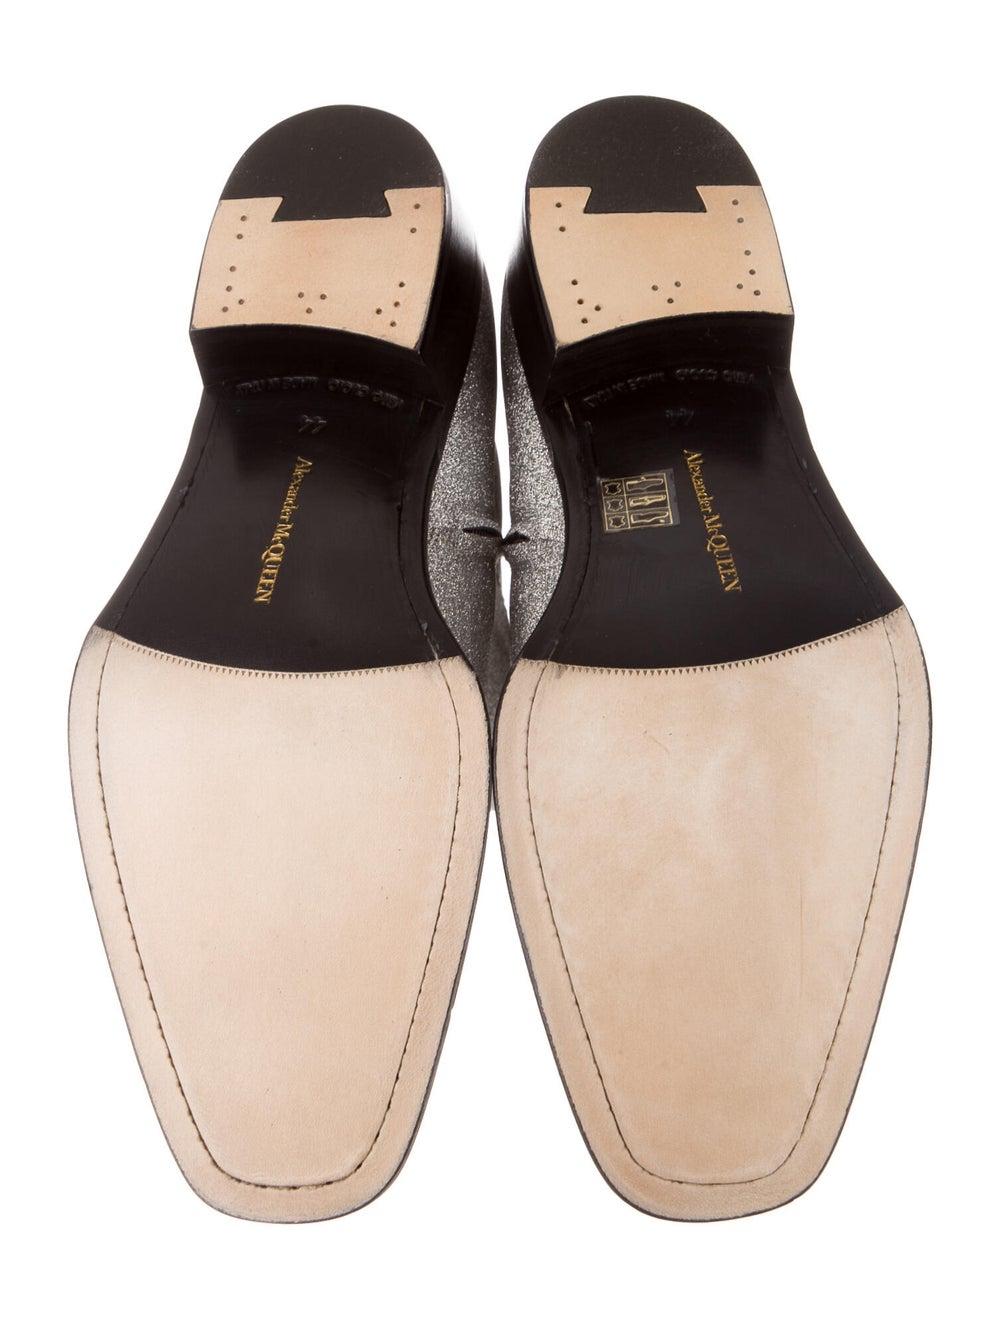 Alexander McQueen Boots Silver - image 5